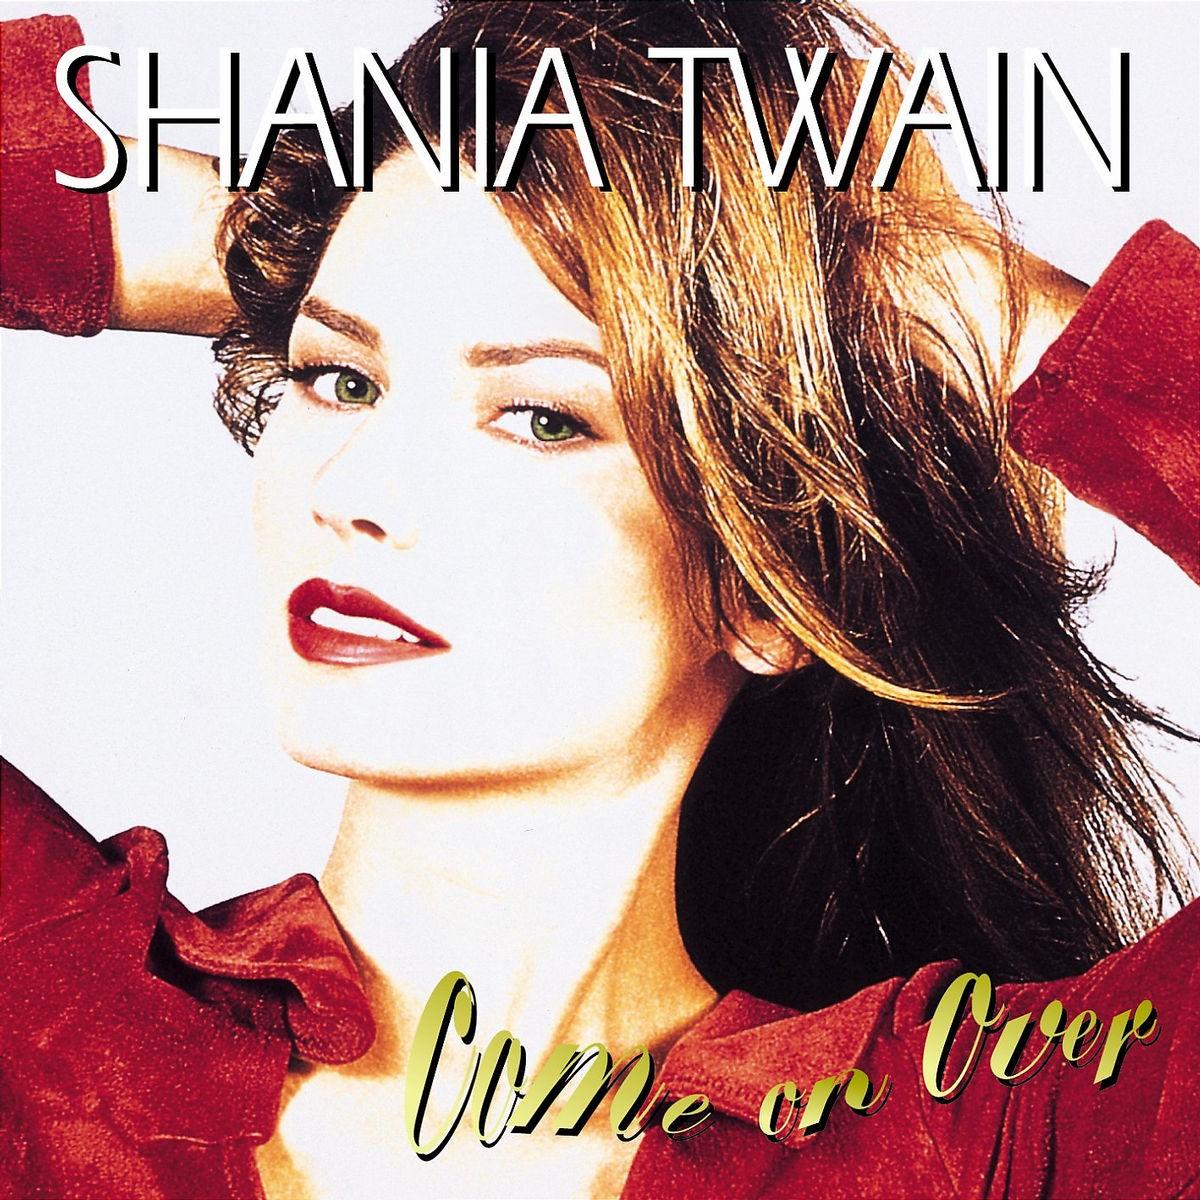 http://4.bp.blogspot.com/_3oLB6Otdlcs/TUqV72v5u_I/AAAAAAAAJqE/1FDU_nvLOcY/s1600/shania_twain_come_on_over_1997_album-front.jpg